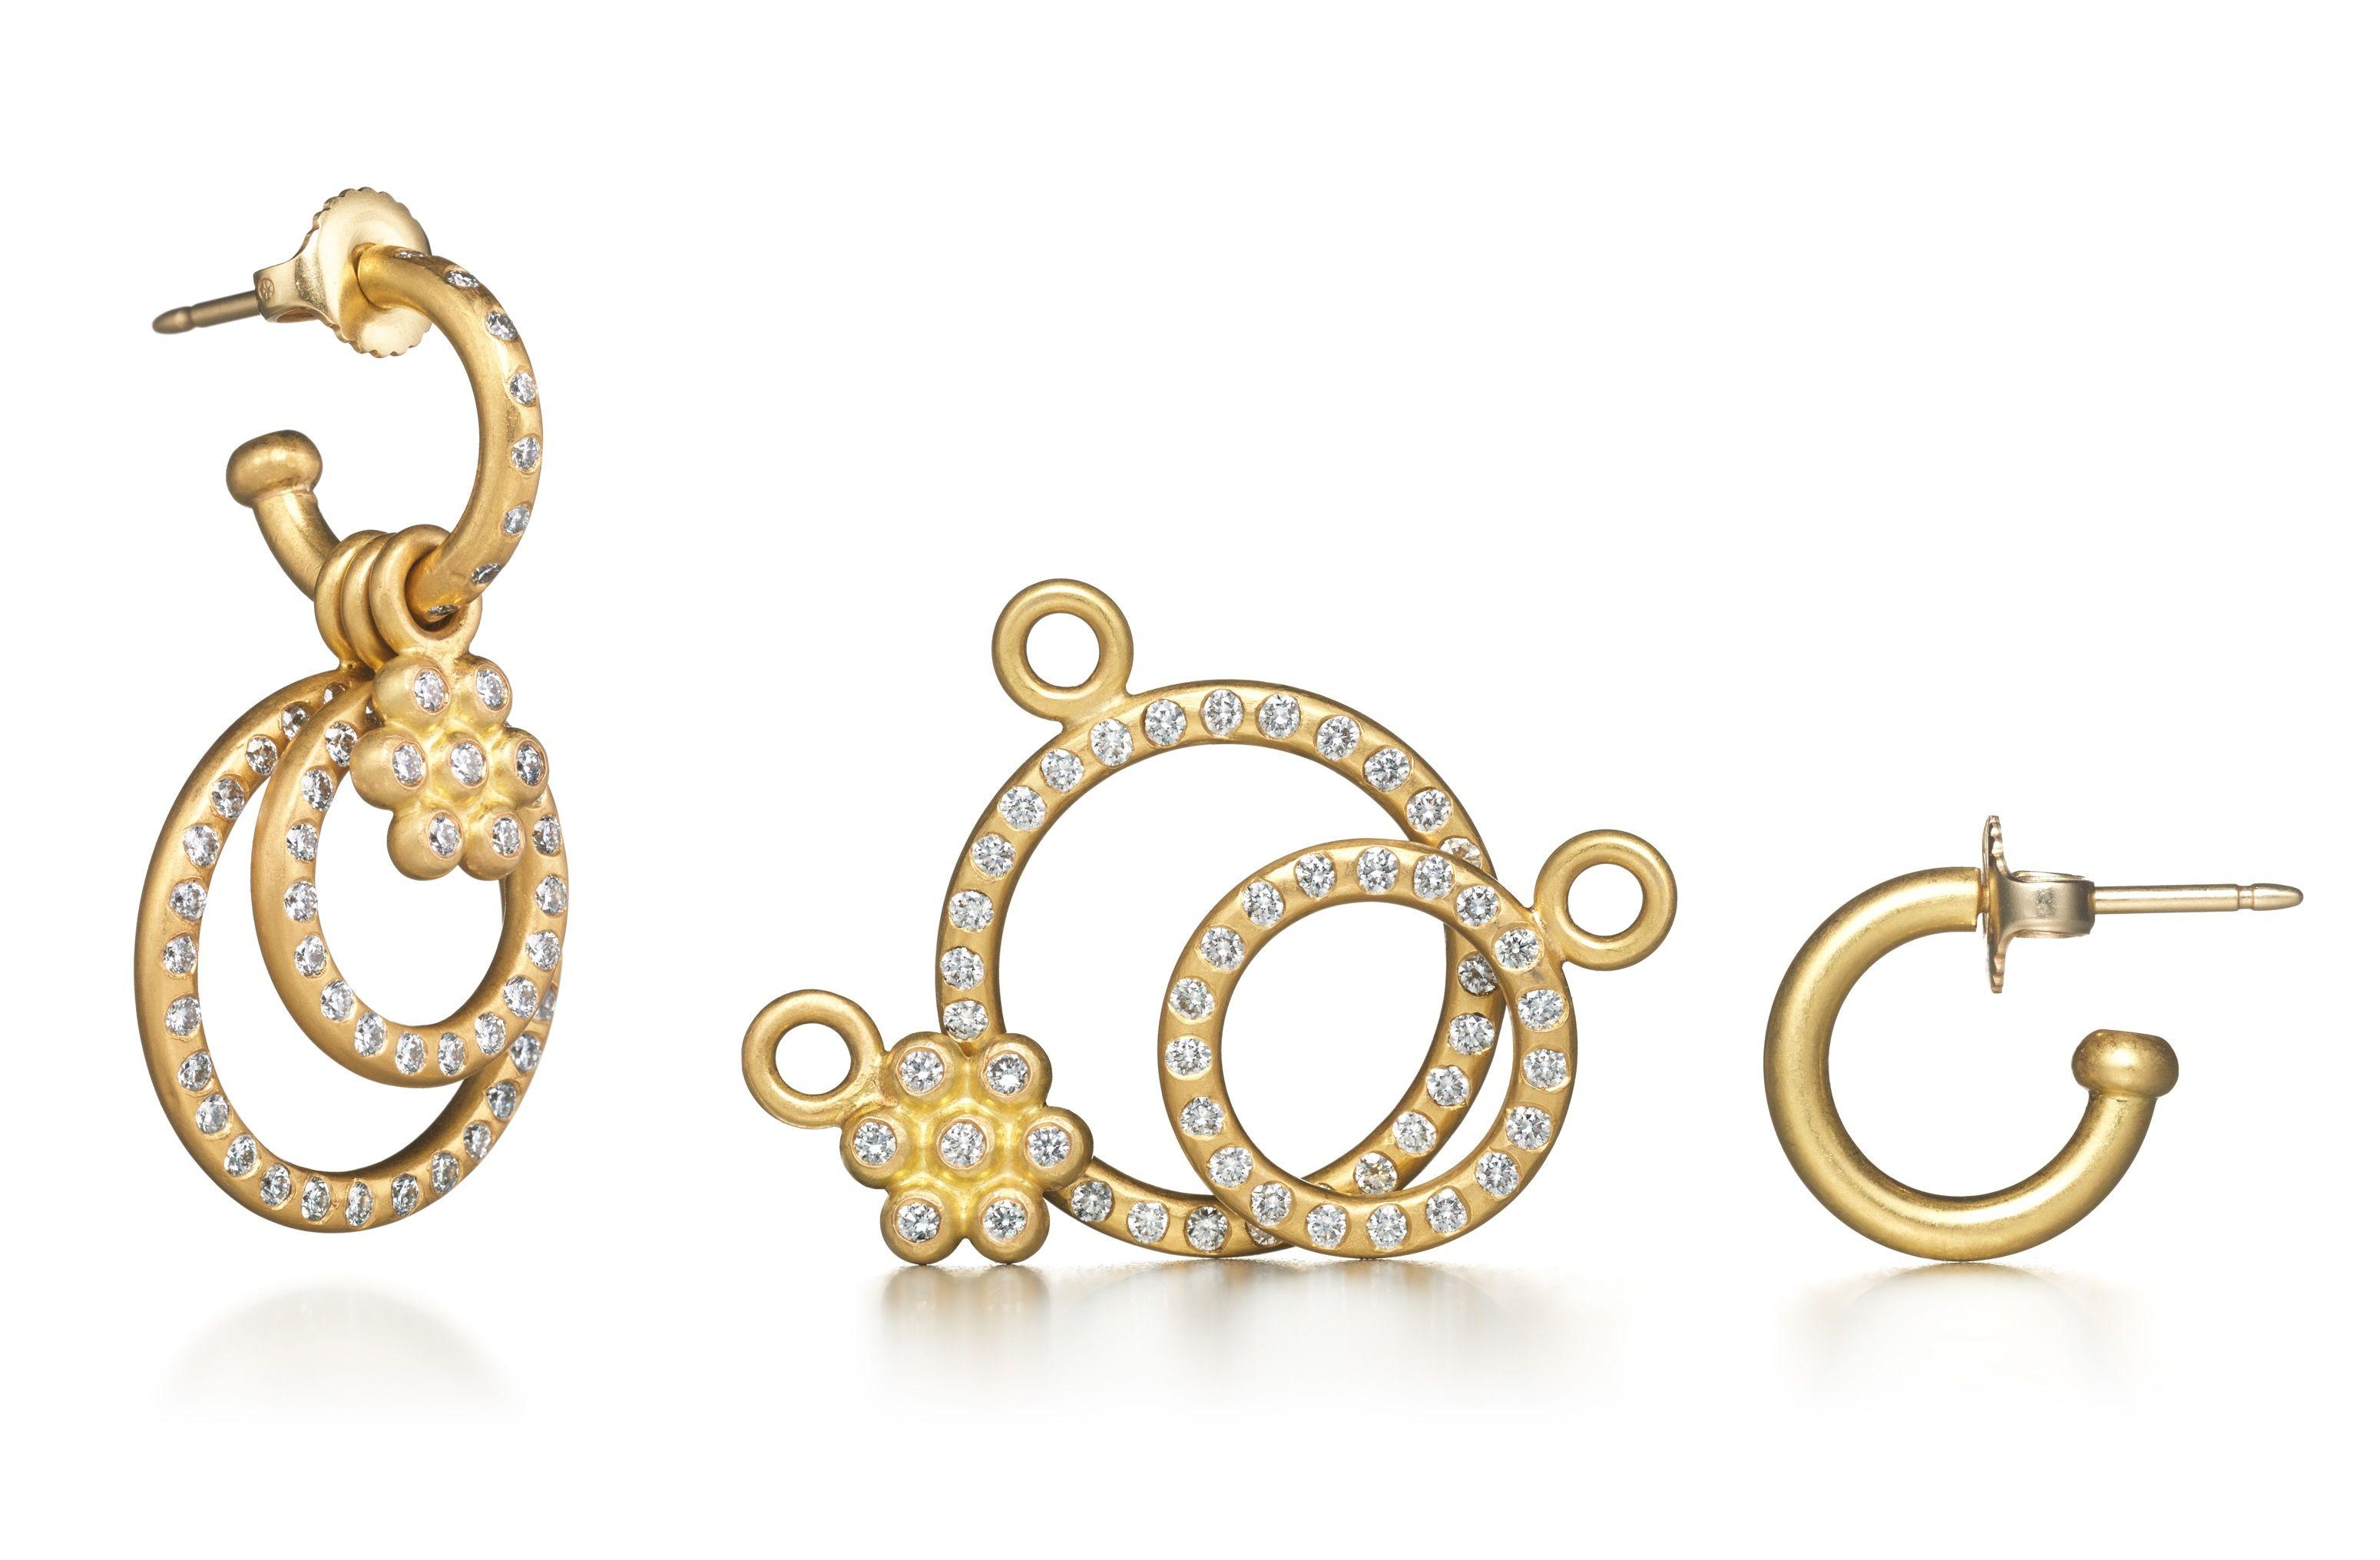 JewelryWhite_26.jpg